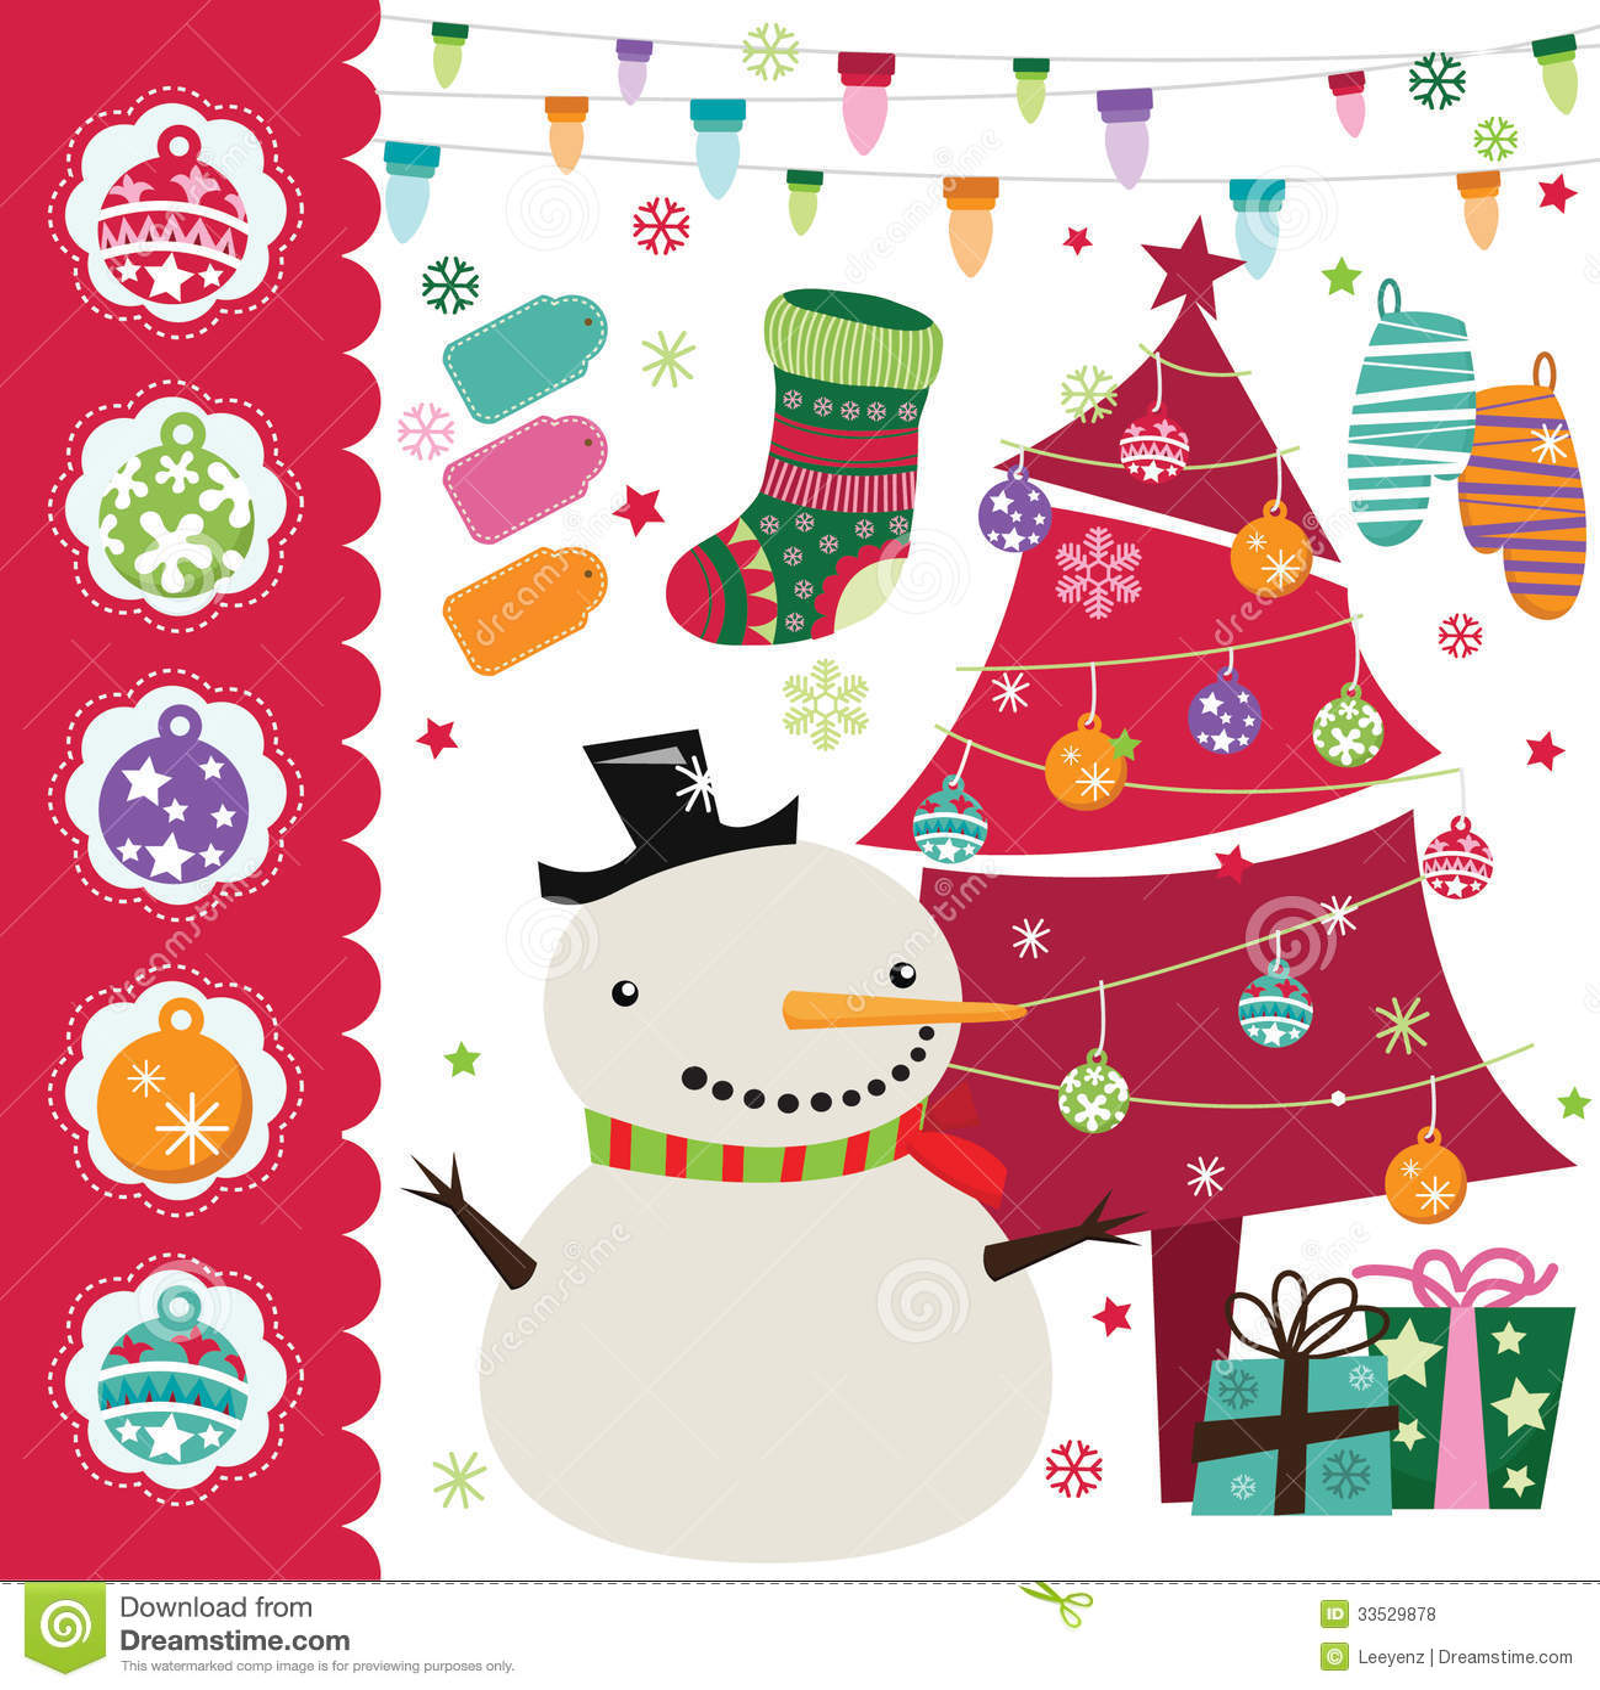 Christmas Tree Decoration Elements: Christmas Elements Set Royalty Free Stock Photos